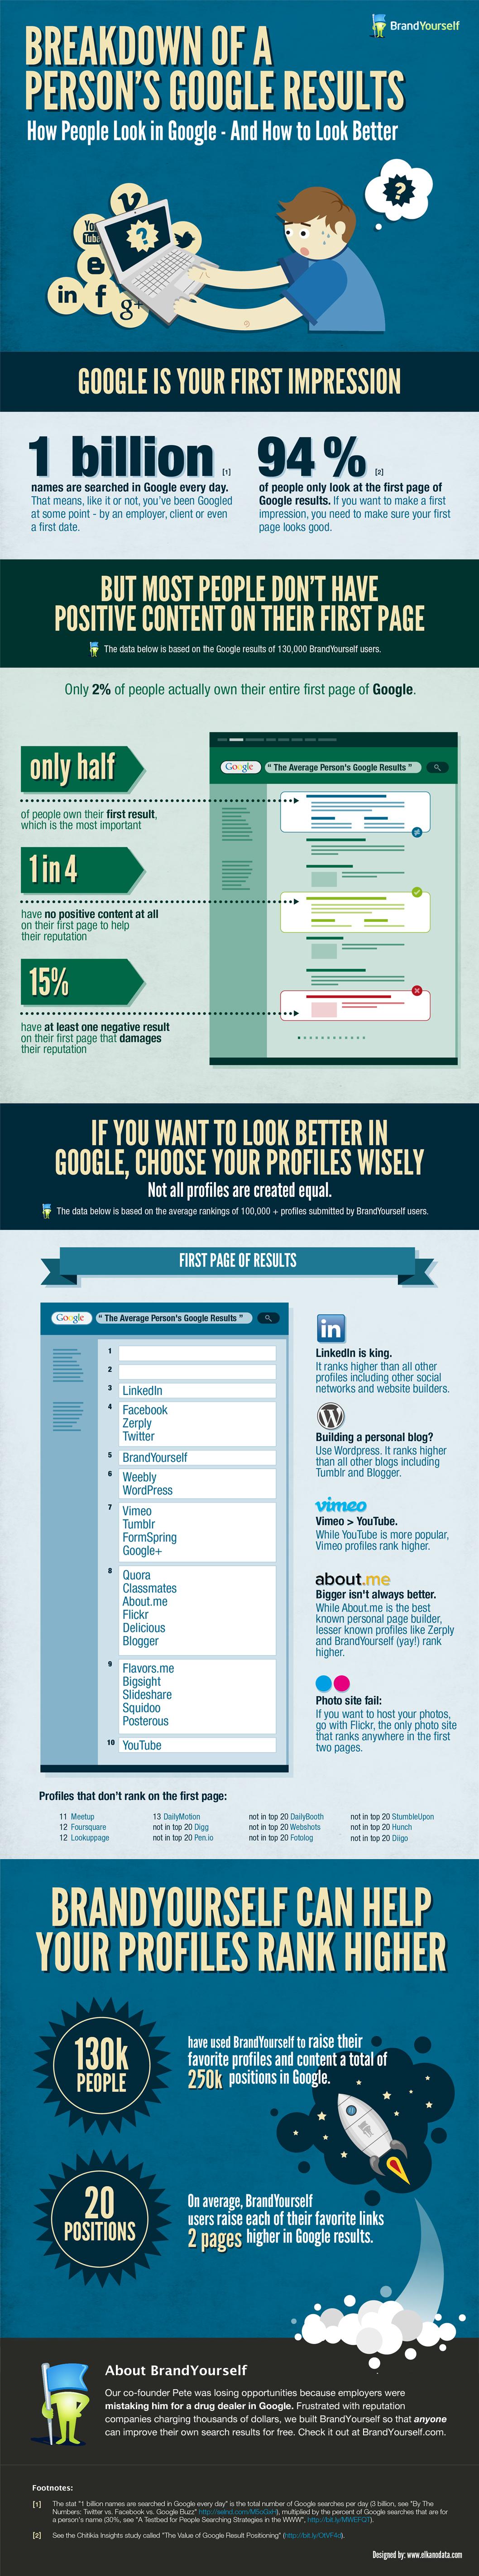 BrandYourself-Infographic.jpg